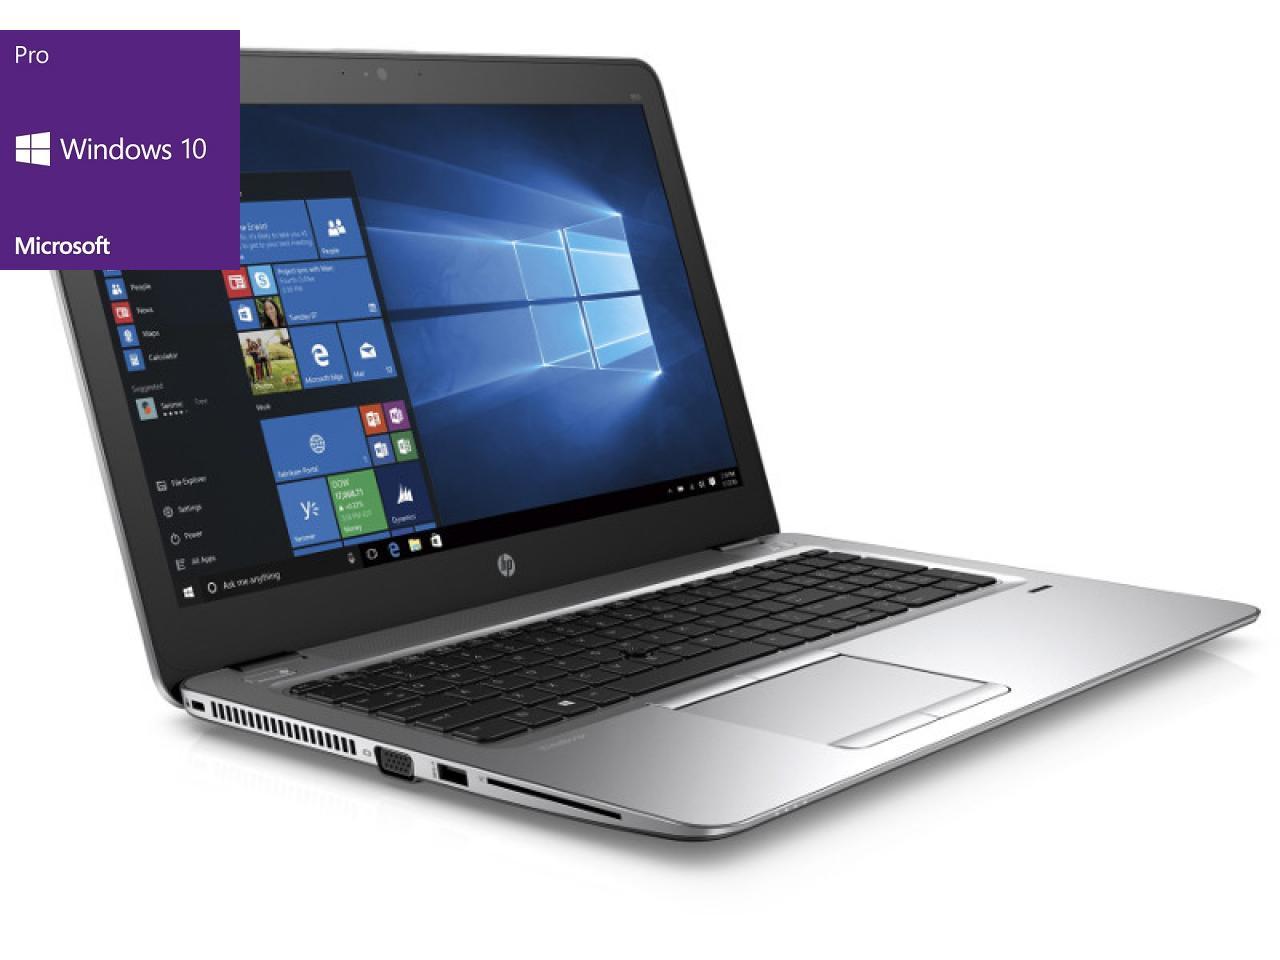 Hewlett Packard EliteBook 850 G3